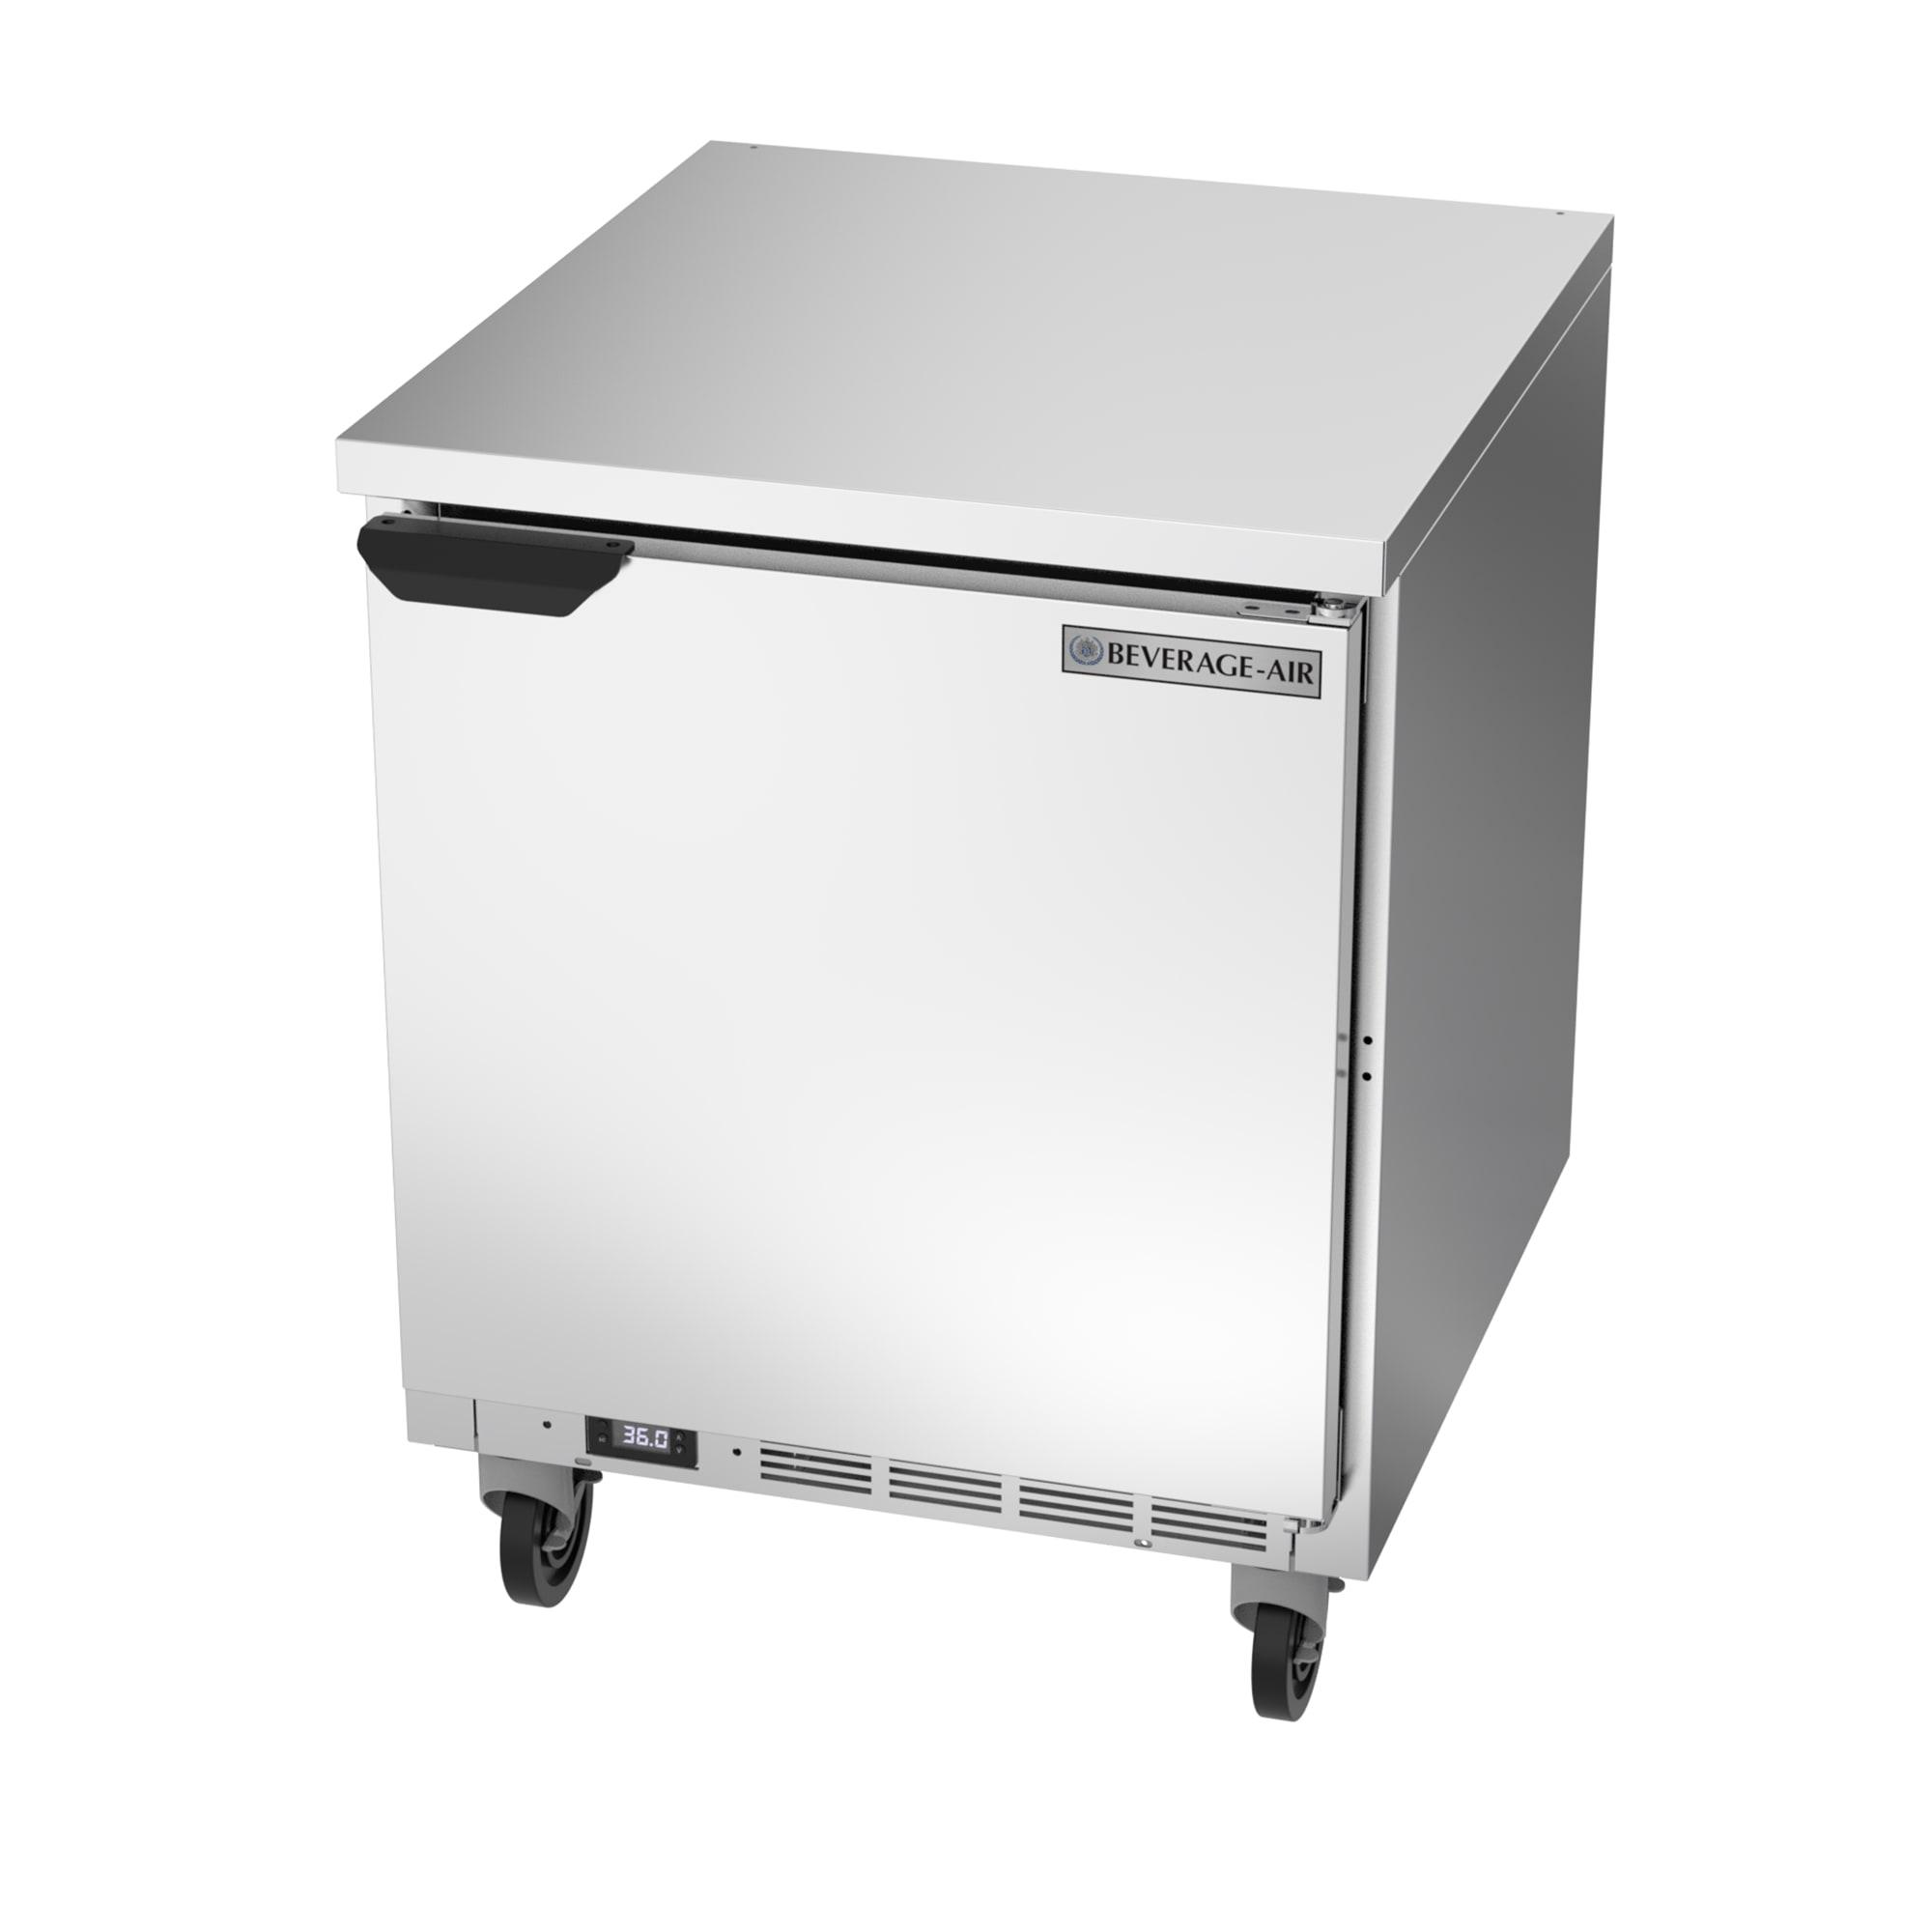 "Beverage Air WTR27AHC-FLT 27"" Worktop Refrigerator w/ (1) Section, 115v"